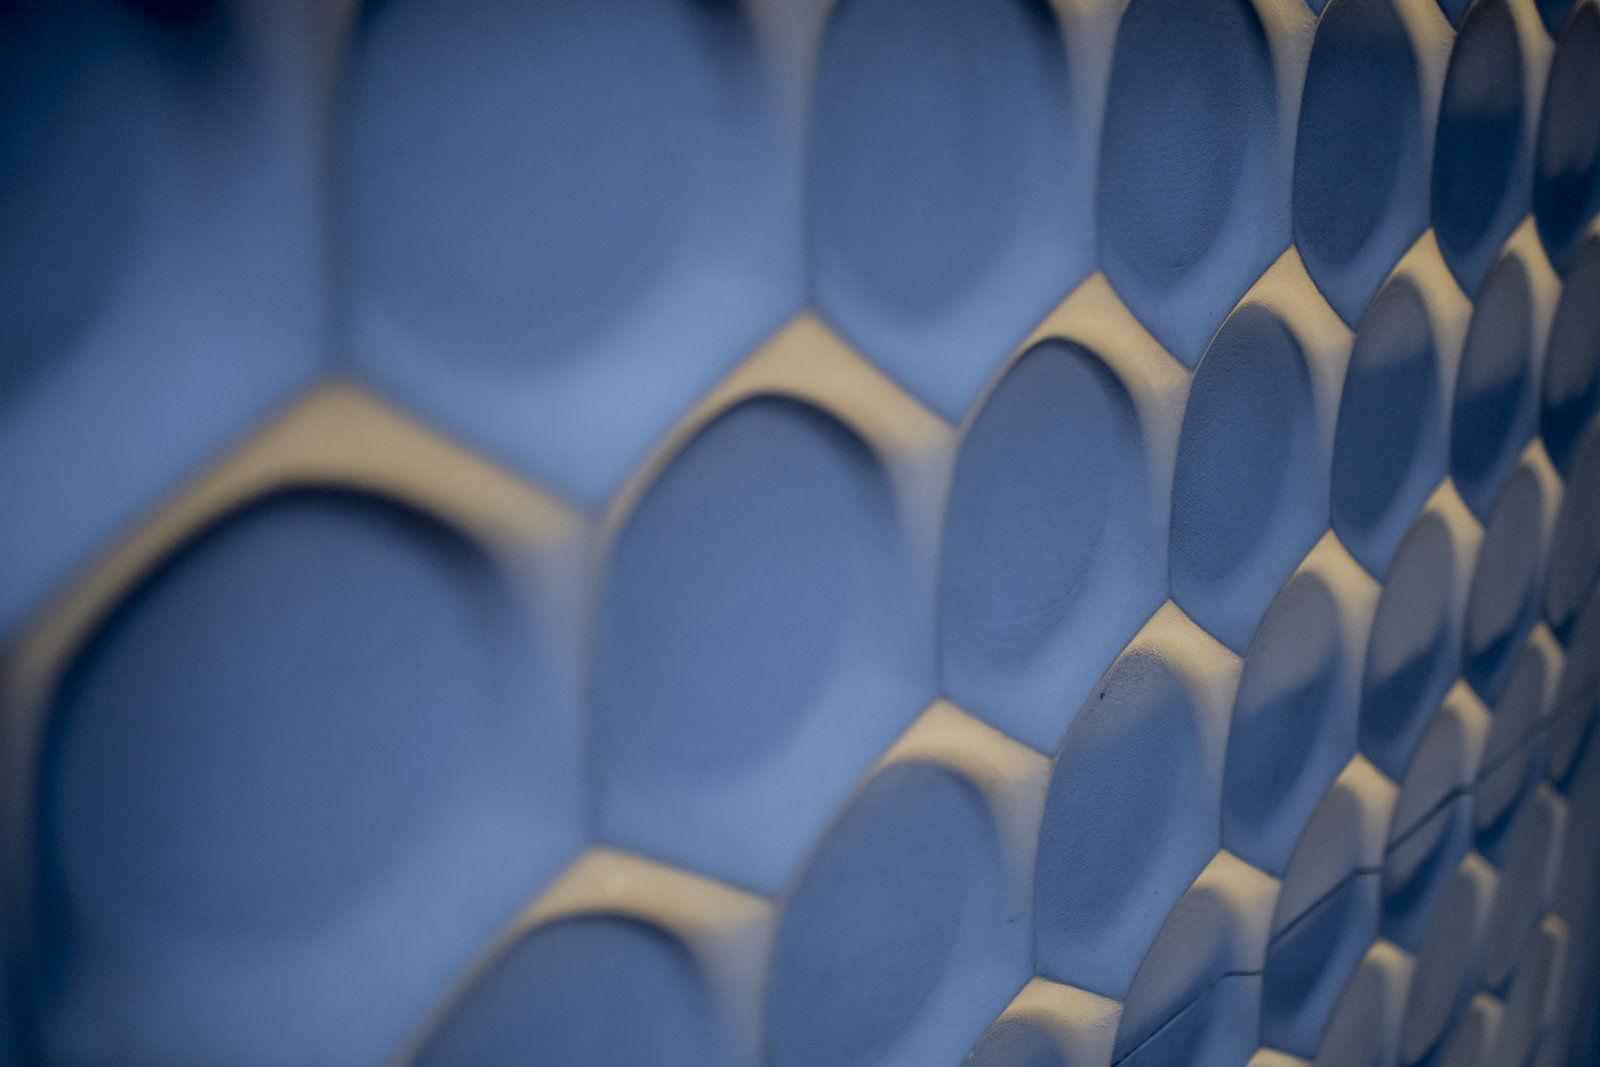 Hexagonal Wall coverings